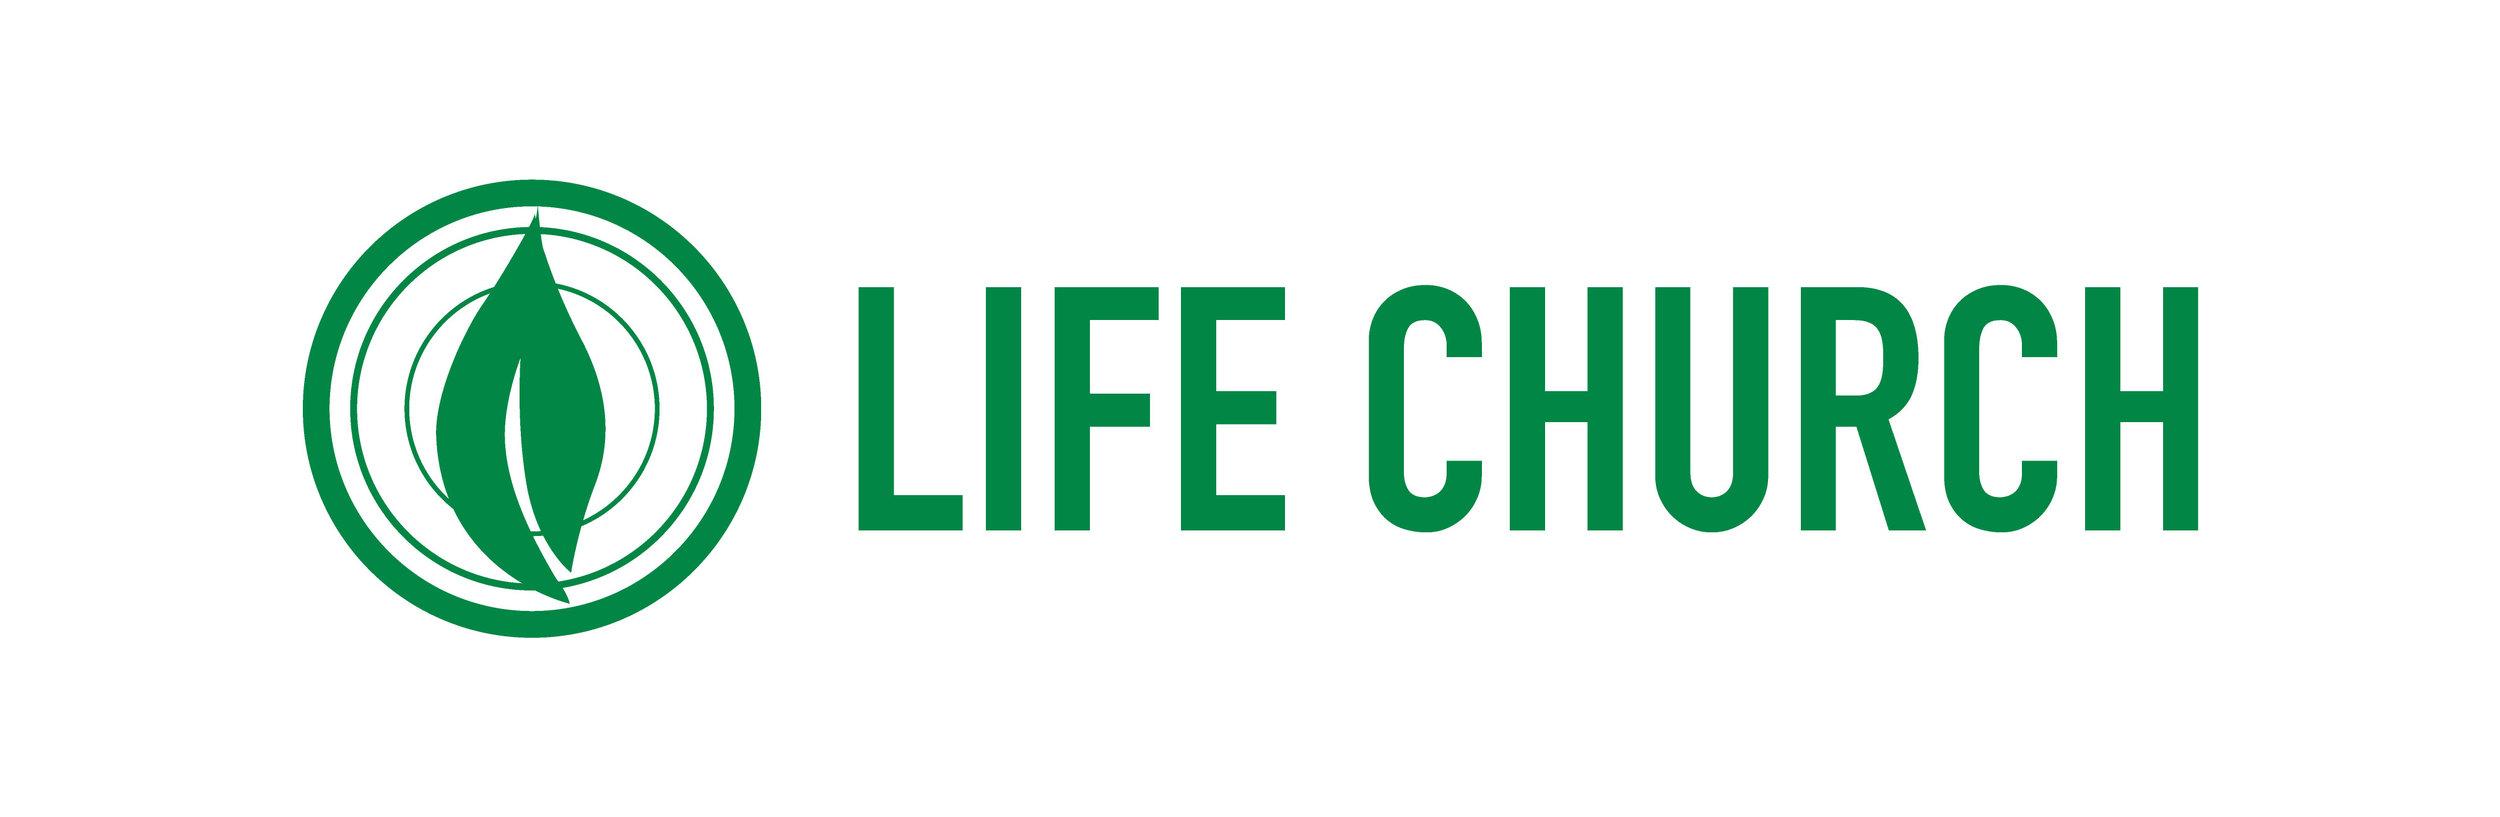 CC-23_Life-Church.jpg